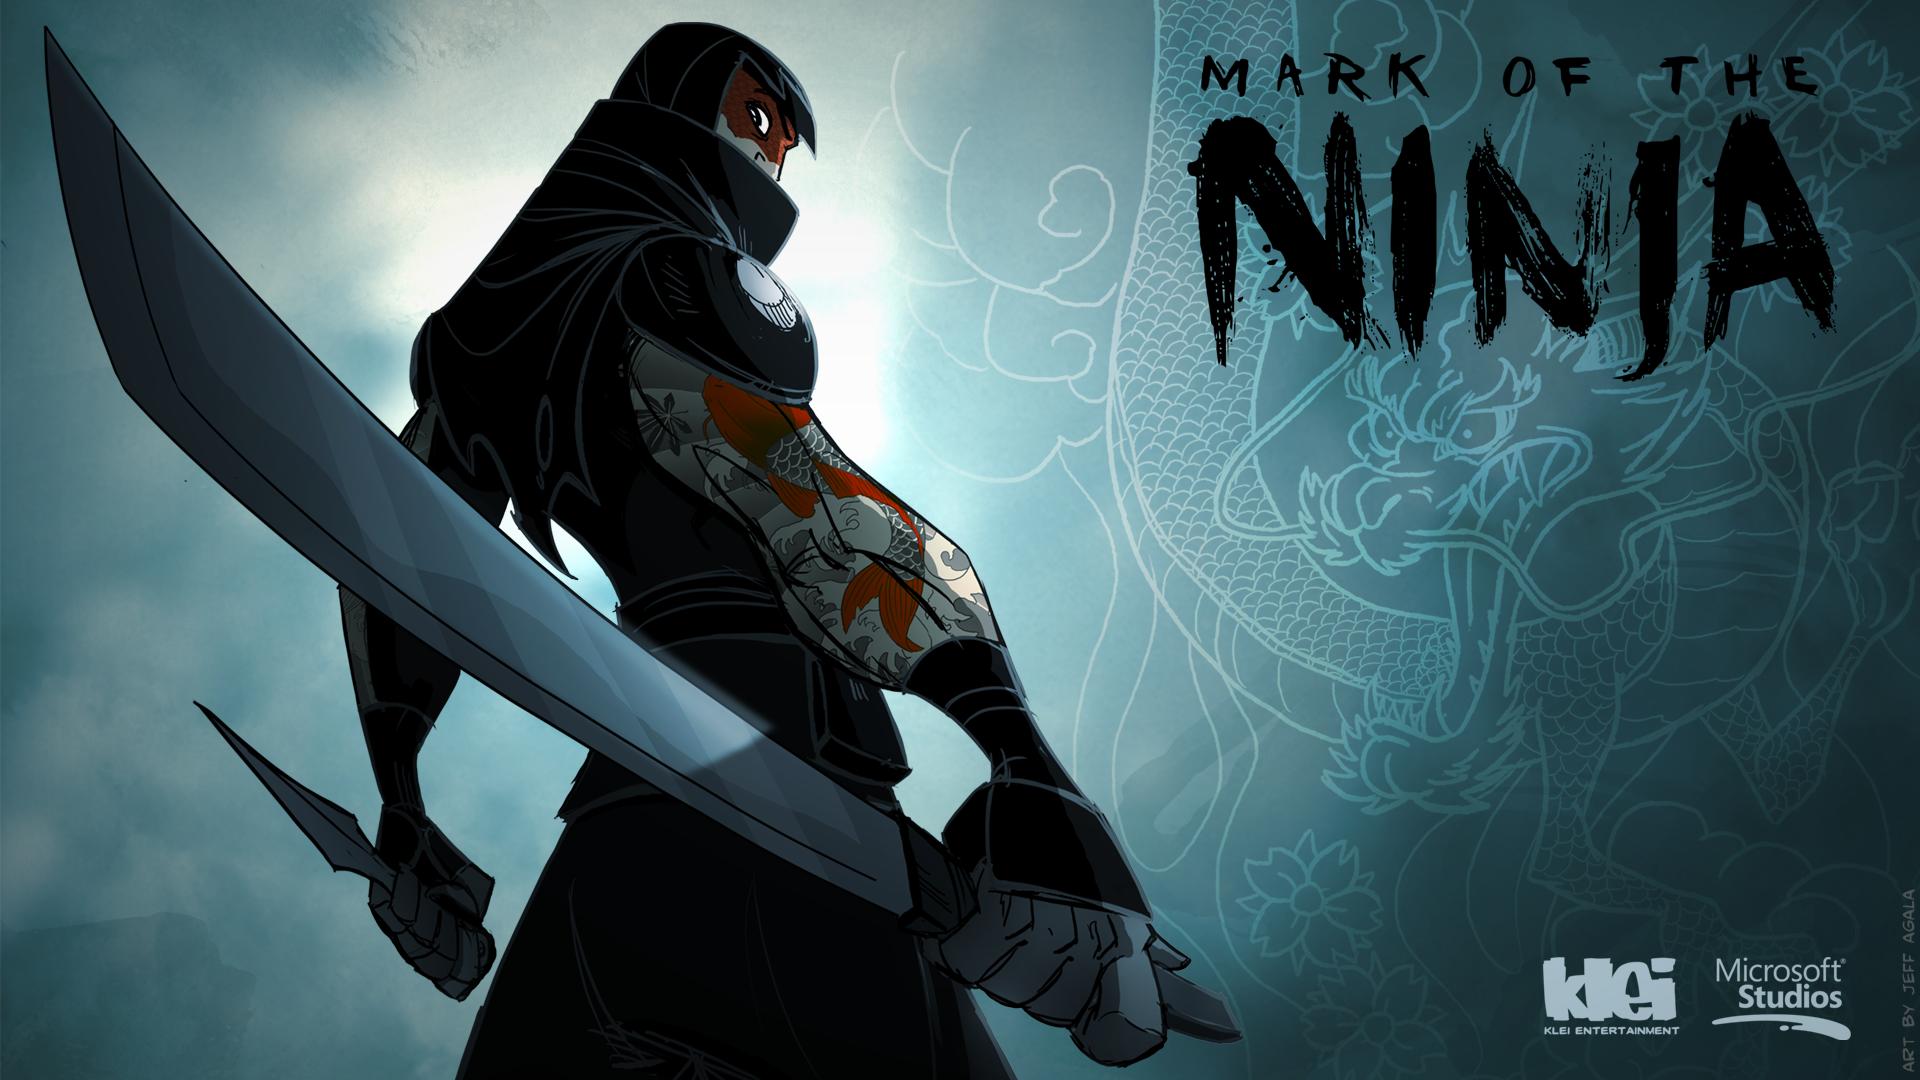 Download 430+ Wallpaper Hd Ninja HD Paling Keren